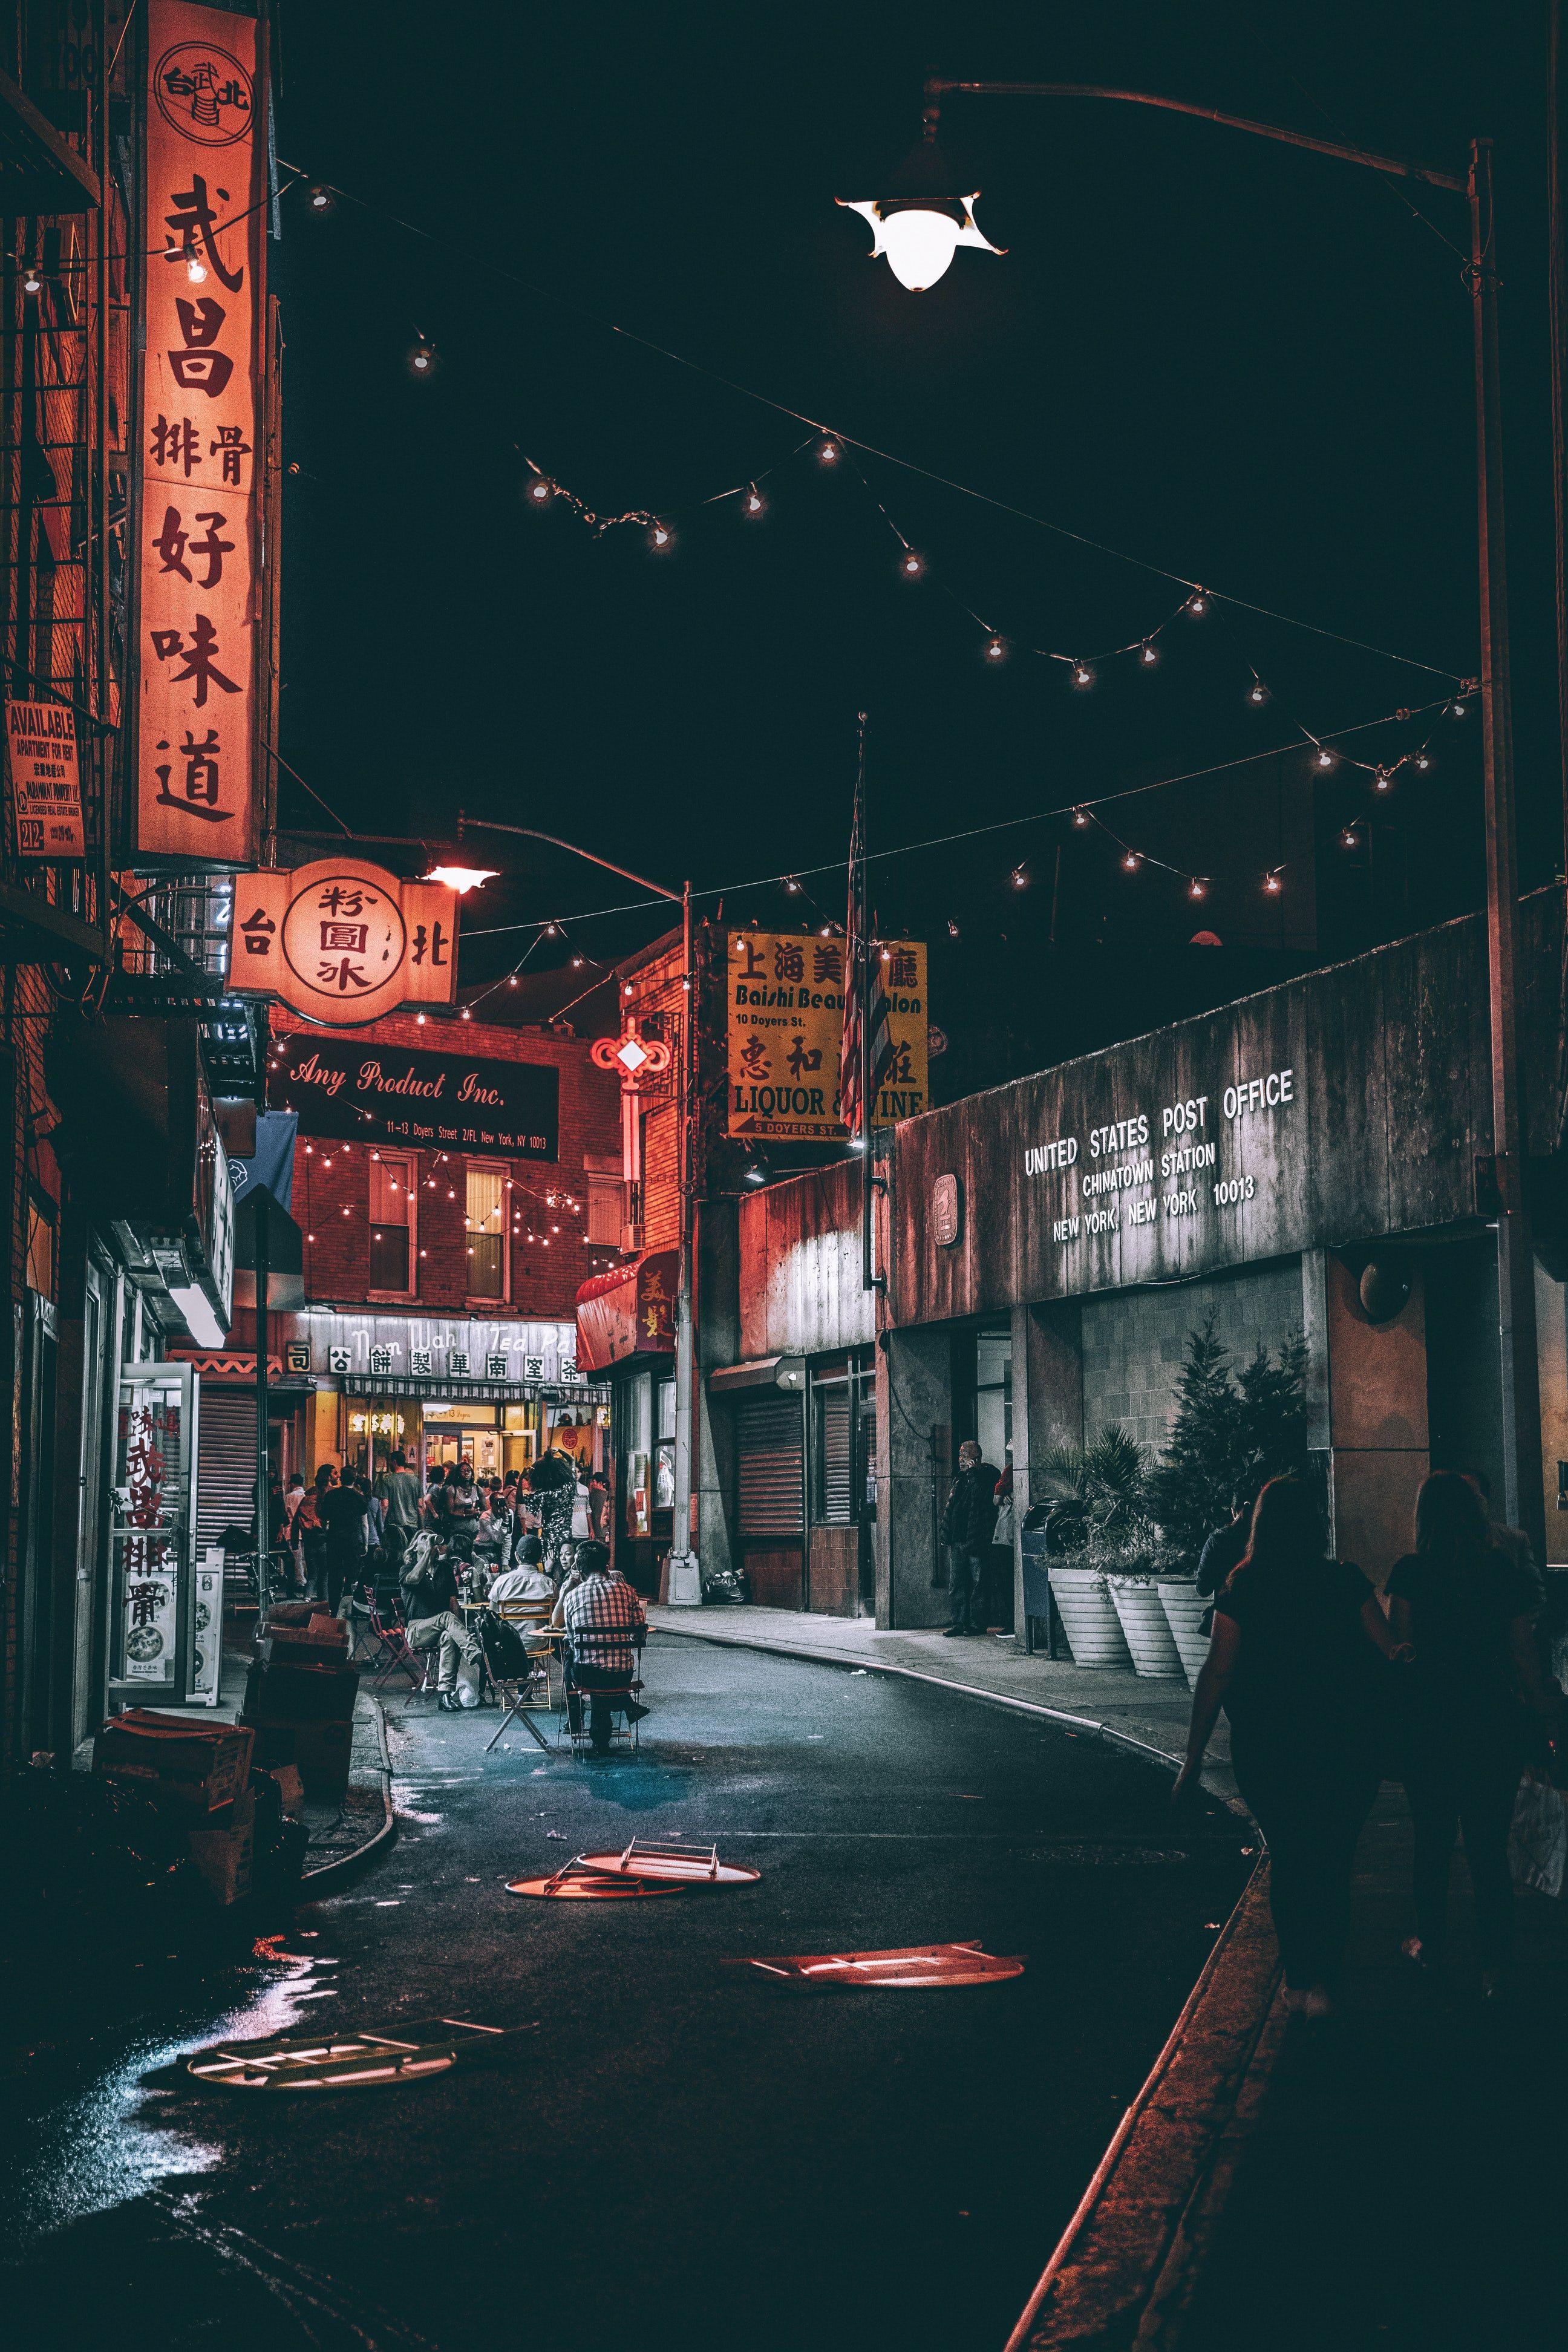 People Between Gray Buildings During Nighttime Gorodskaya Fotografiya Nochnaya Fotografiya Tokio Yaponiya